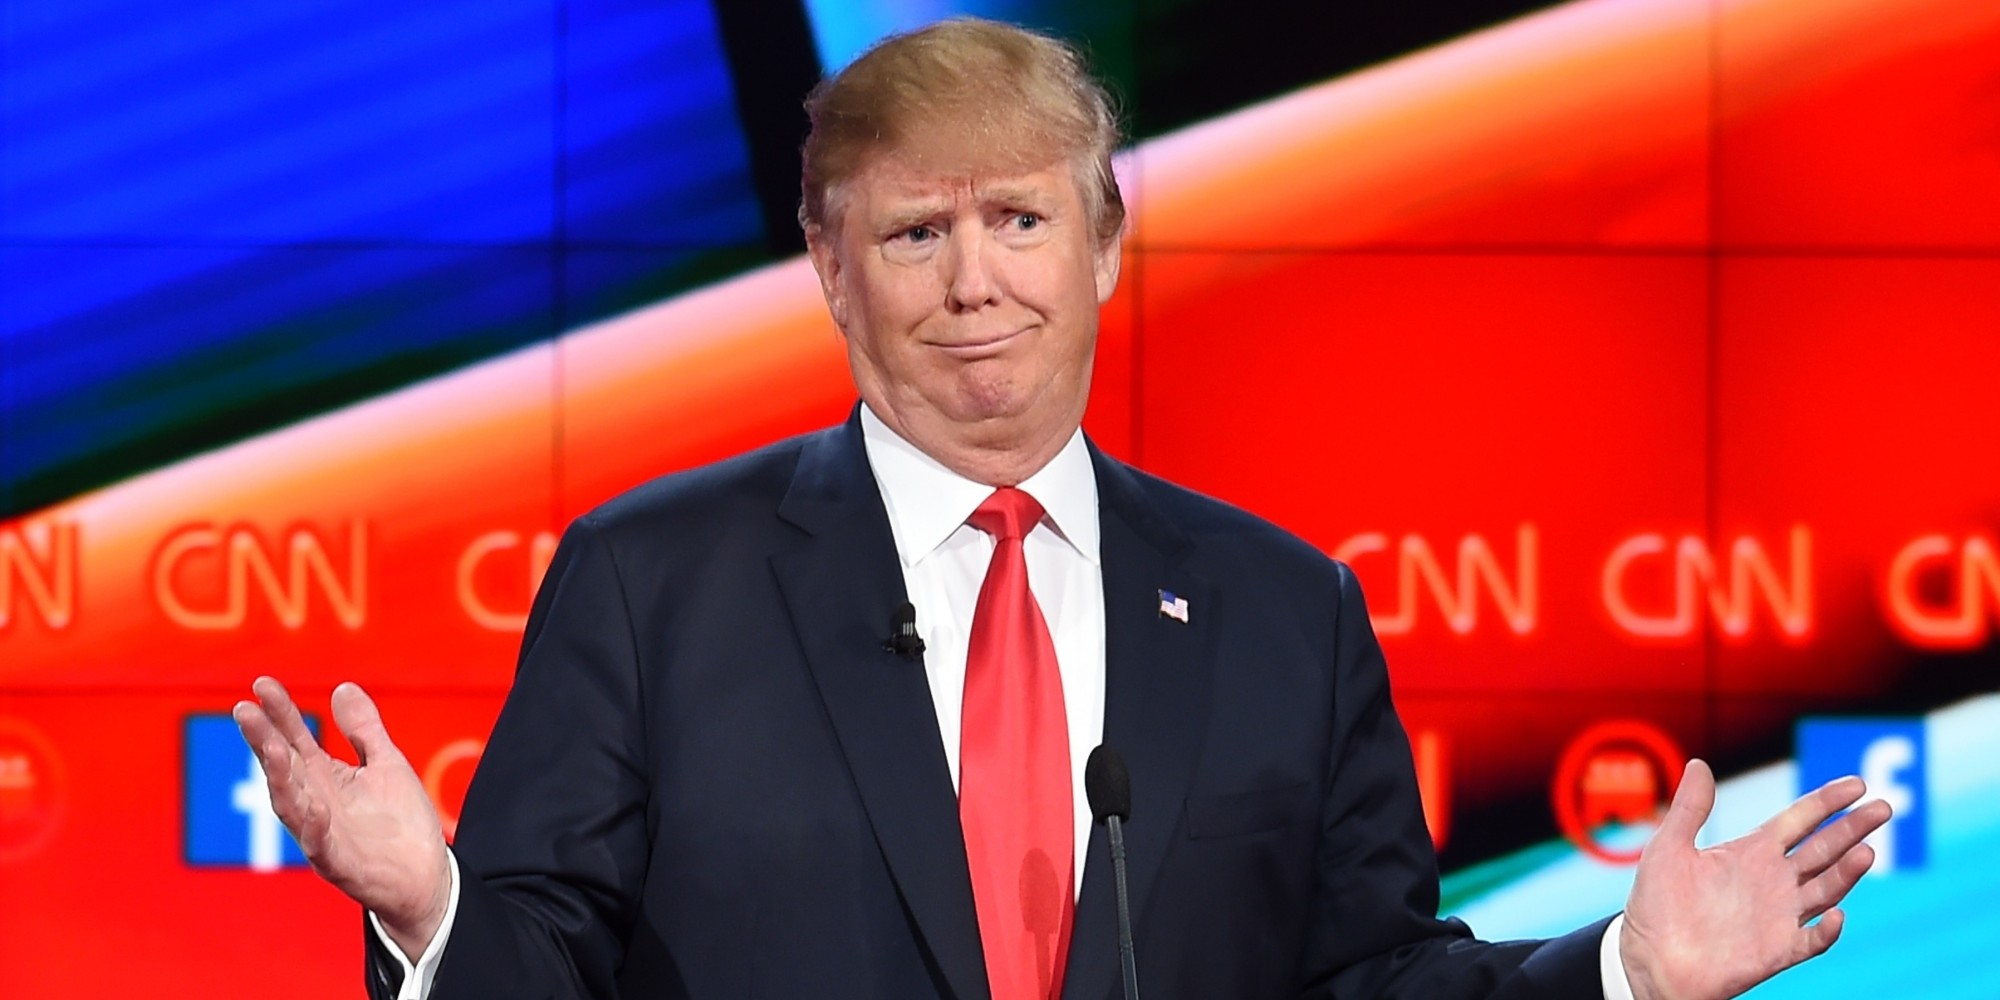 Donald Trump S Face Wins The Last Republican Presidential